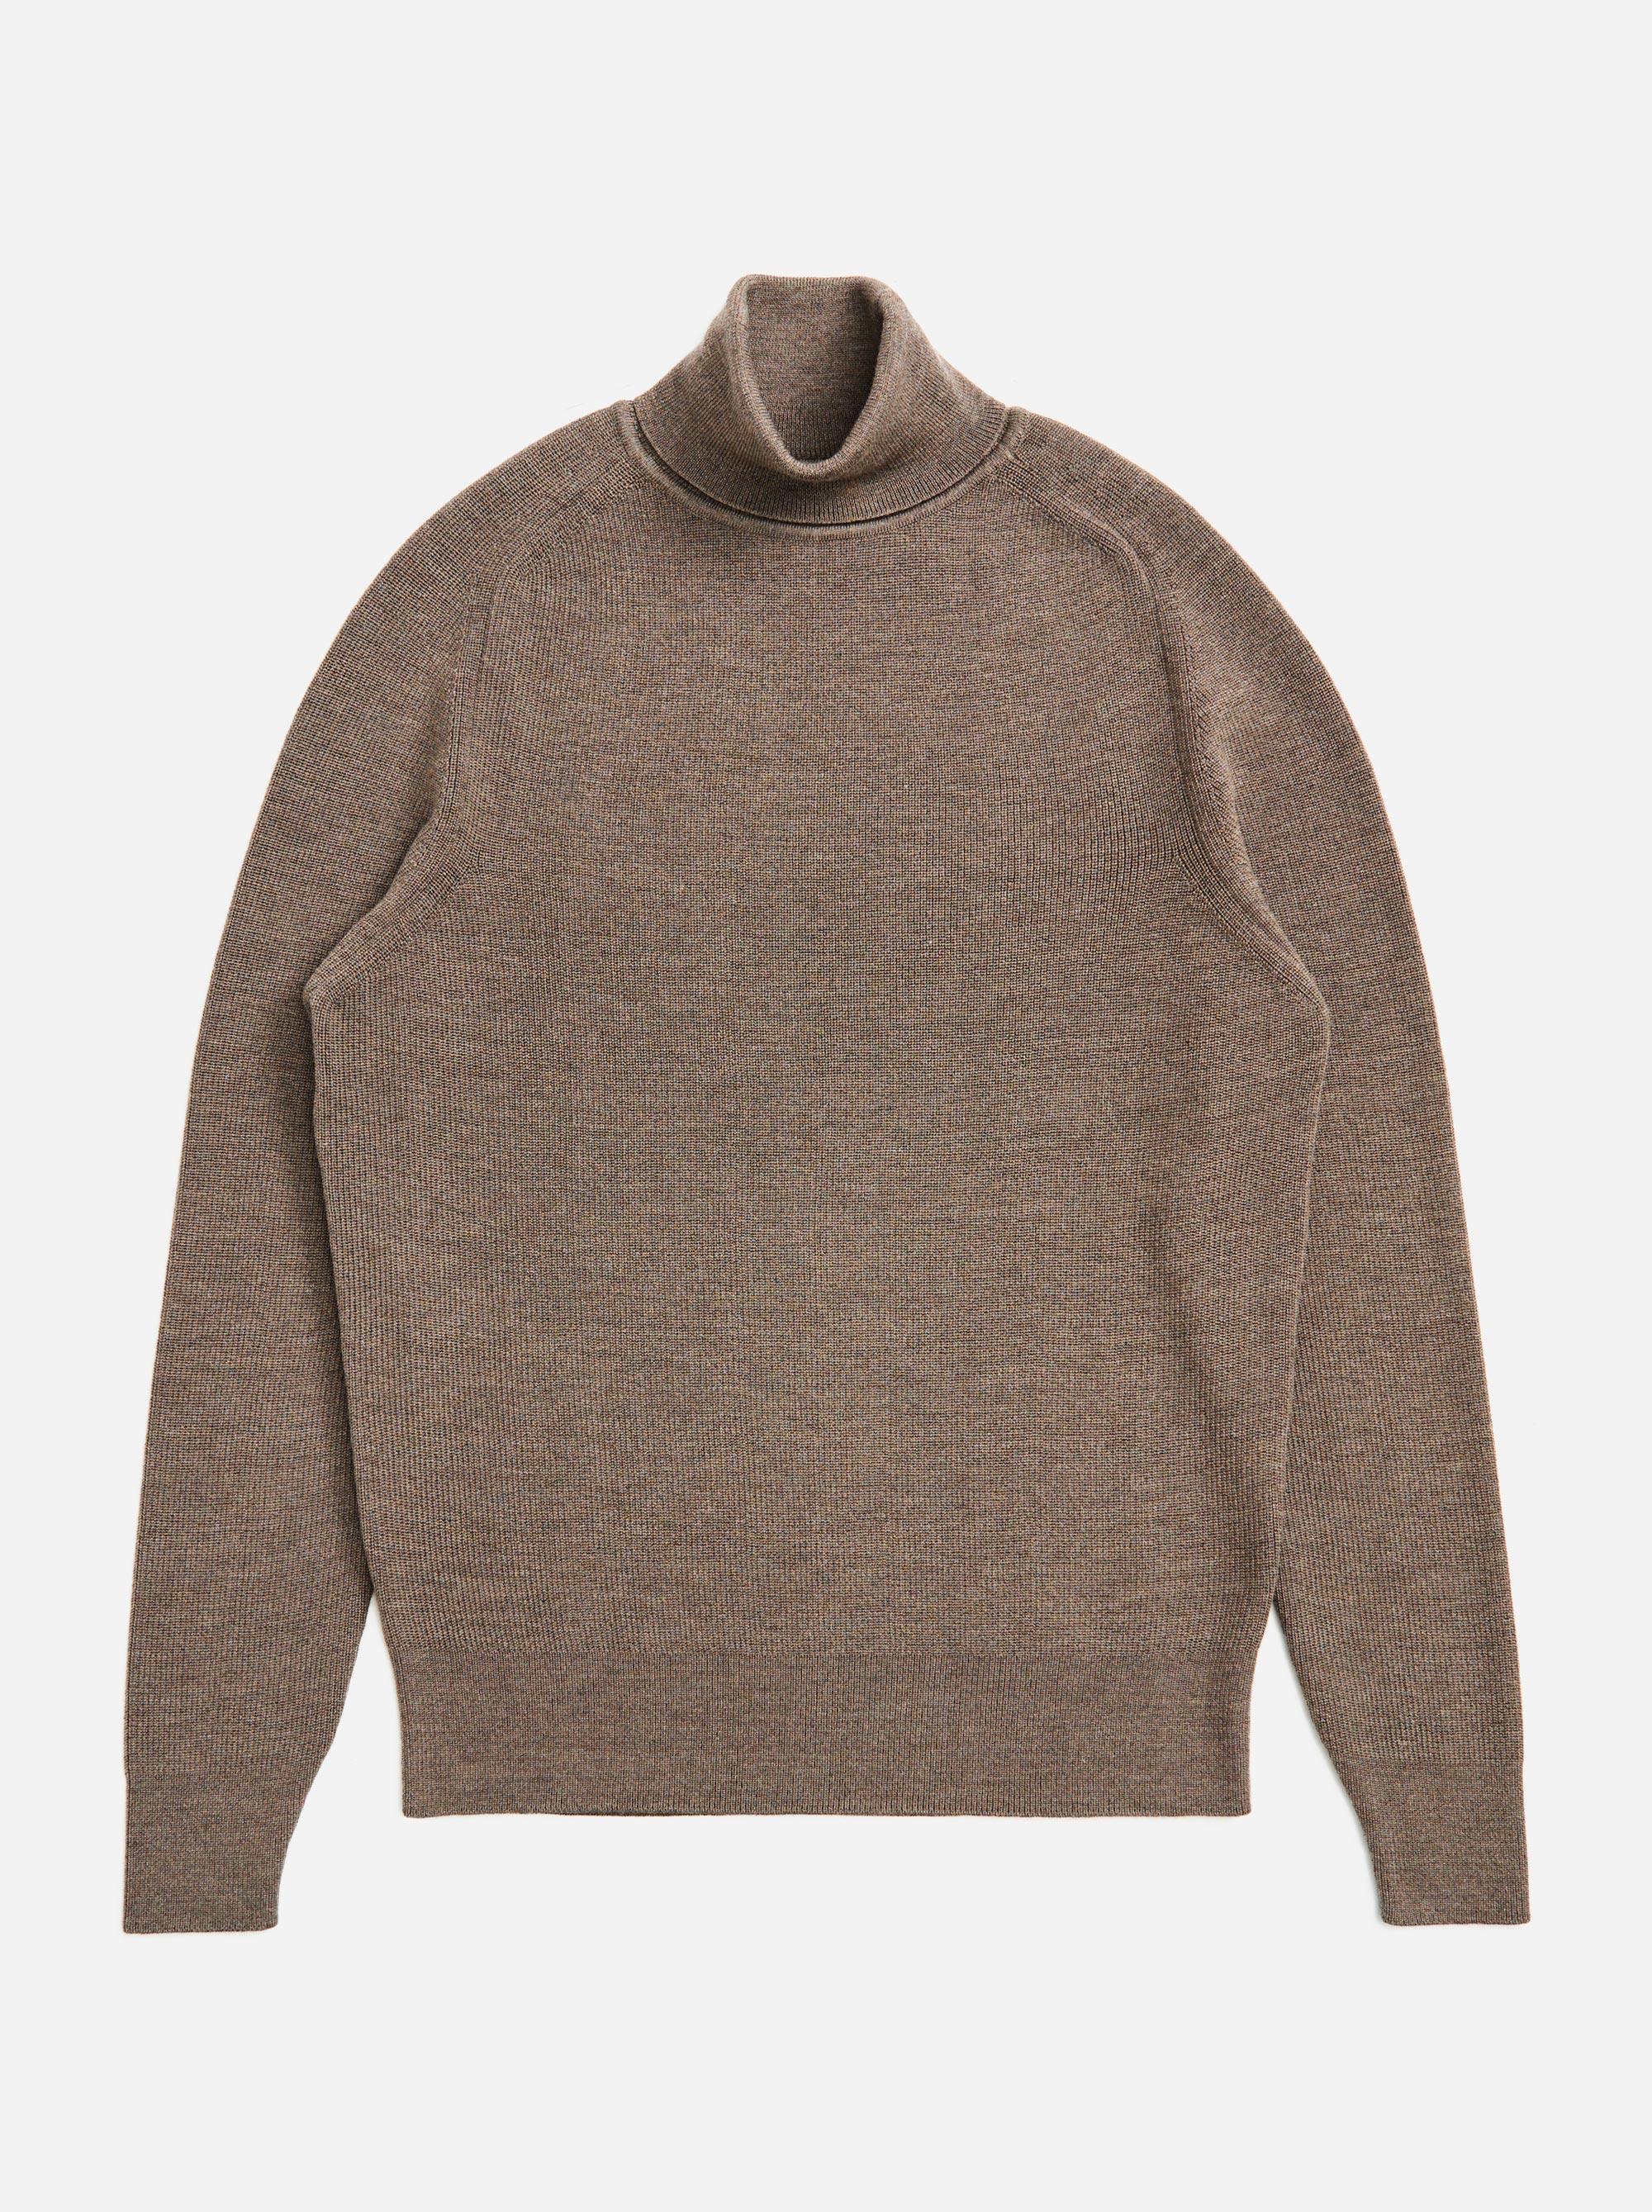 Teym - Turtleneck - The Merino Sweater - Men - Grey - 5